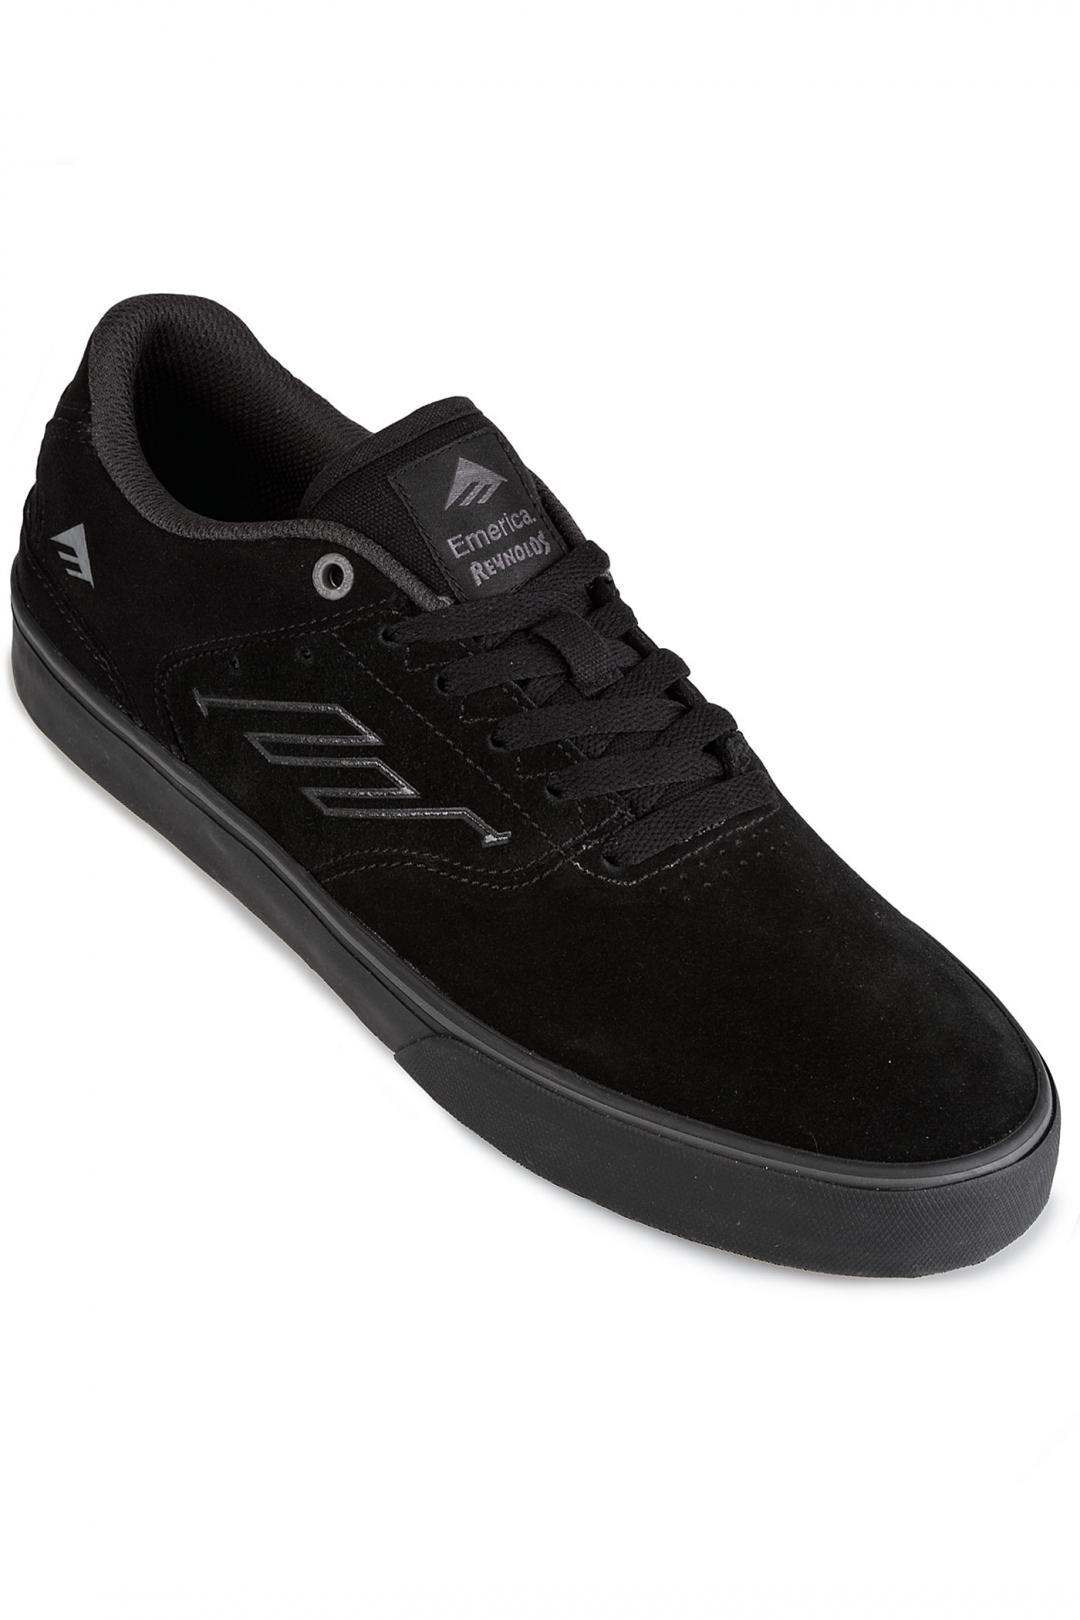 Uomo Emerica The Reynolds Low Vulc black black grey | Scarpe da skate